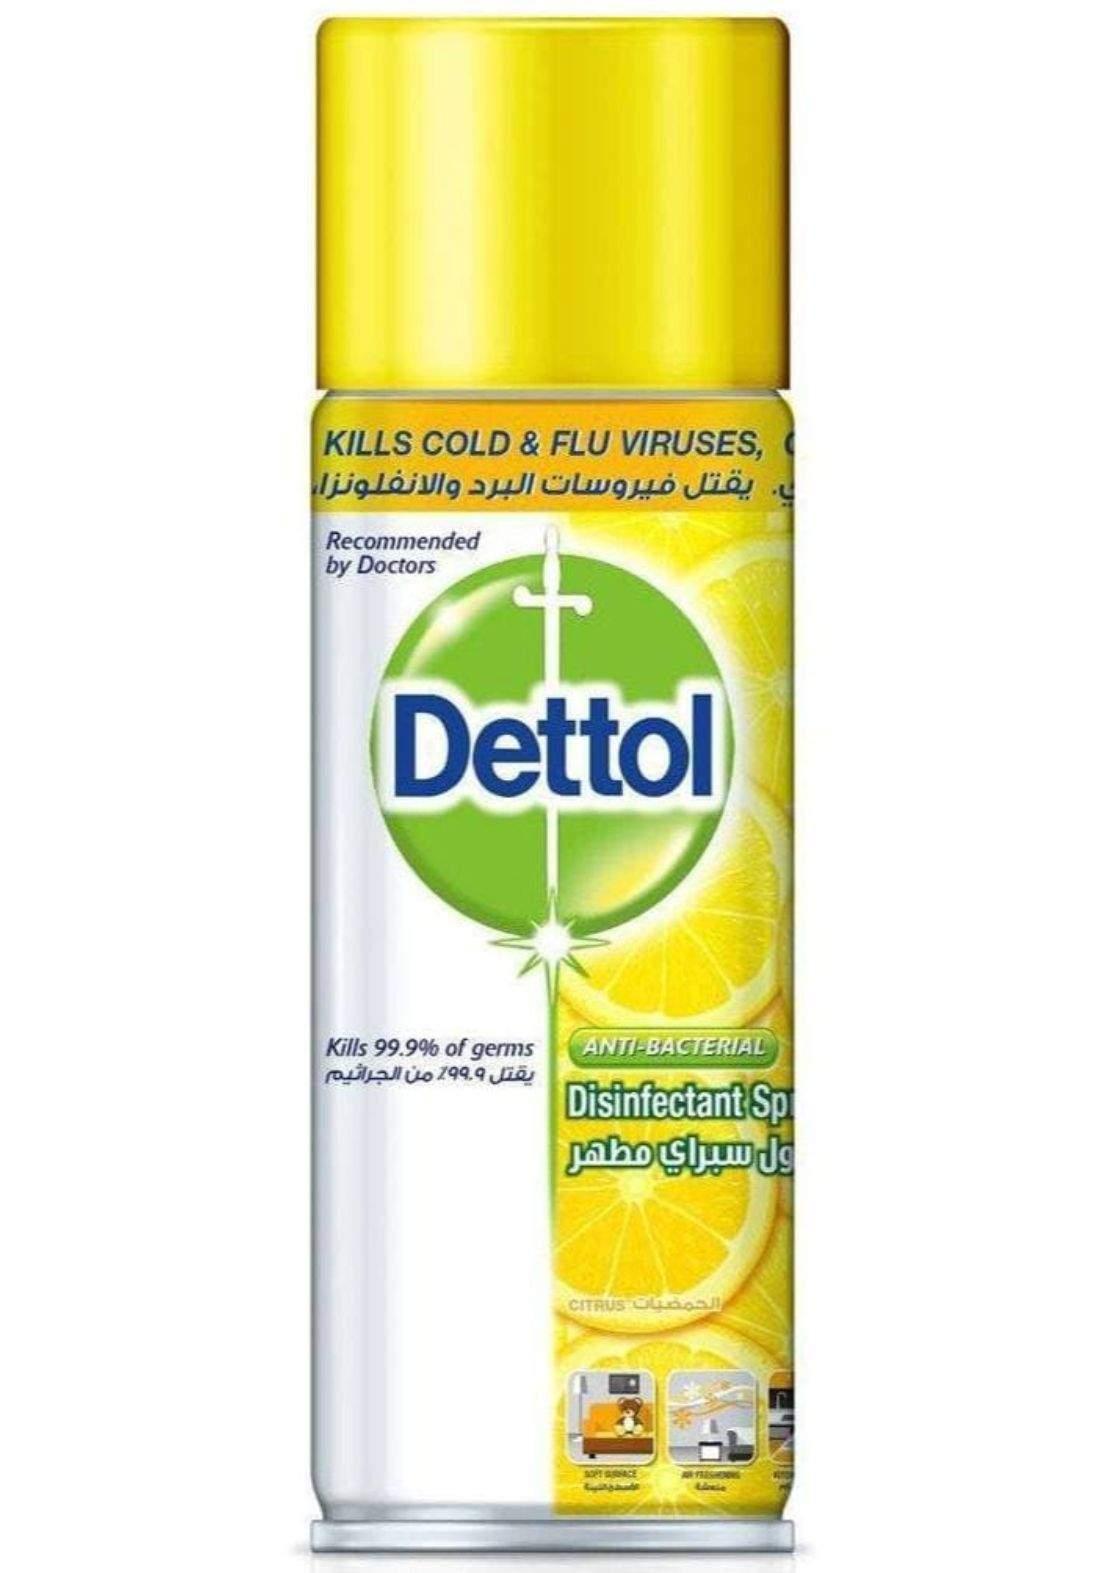 Dettol disinfectant spray 450 ml ديتول سبراي مطهر